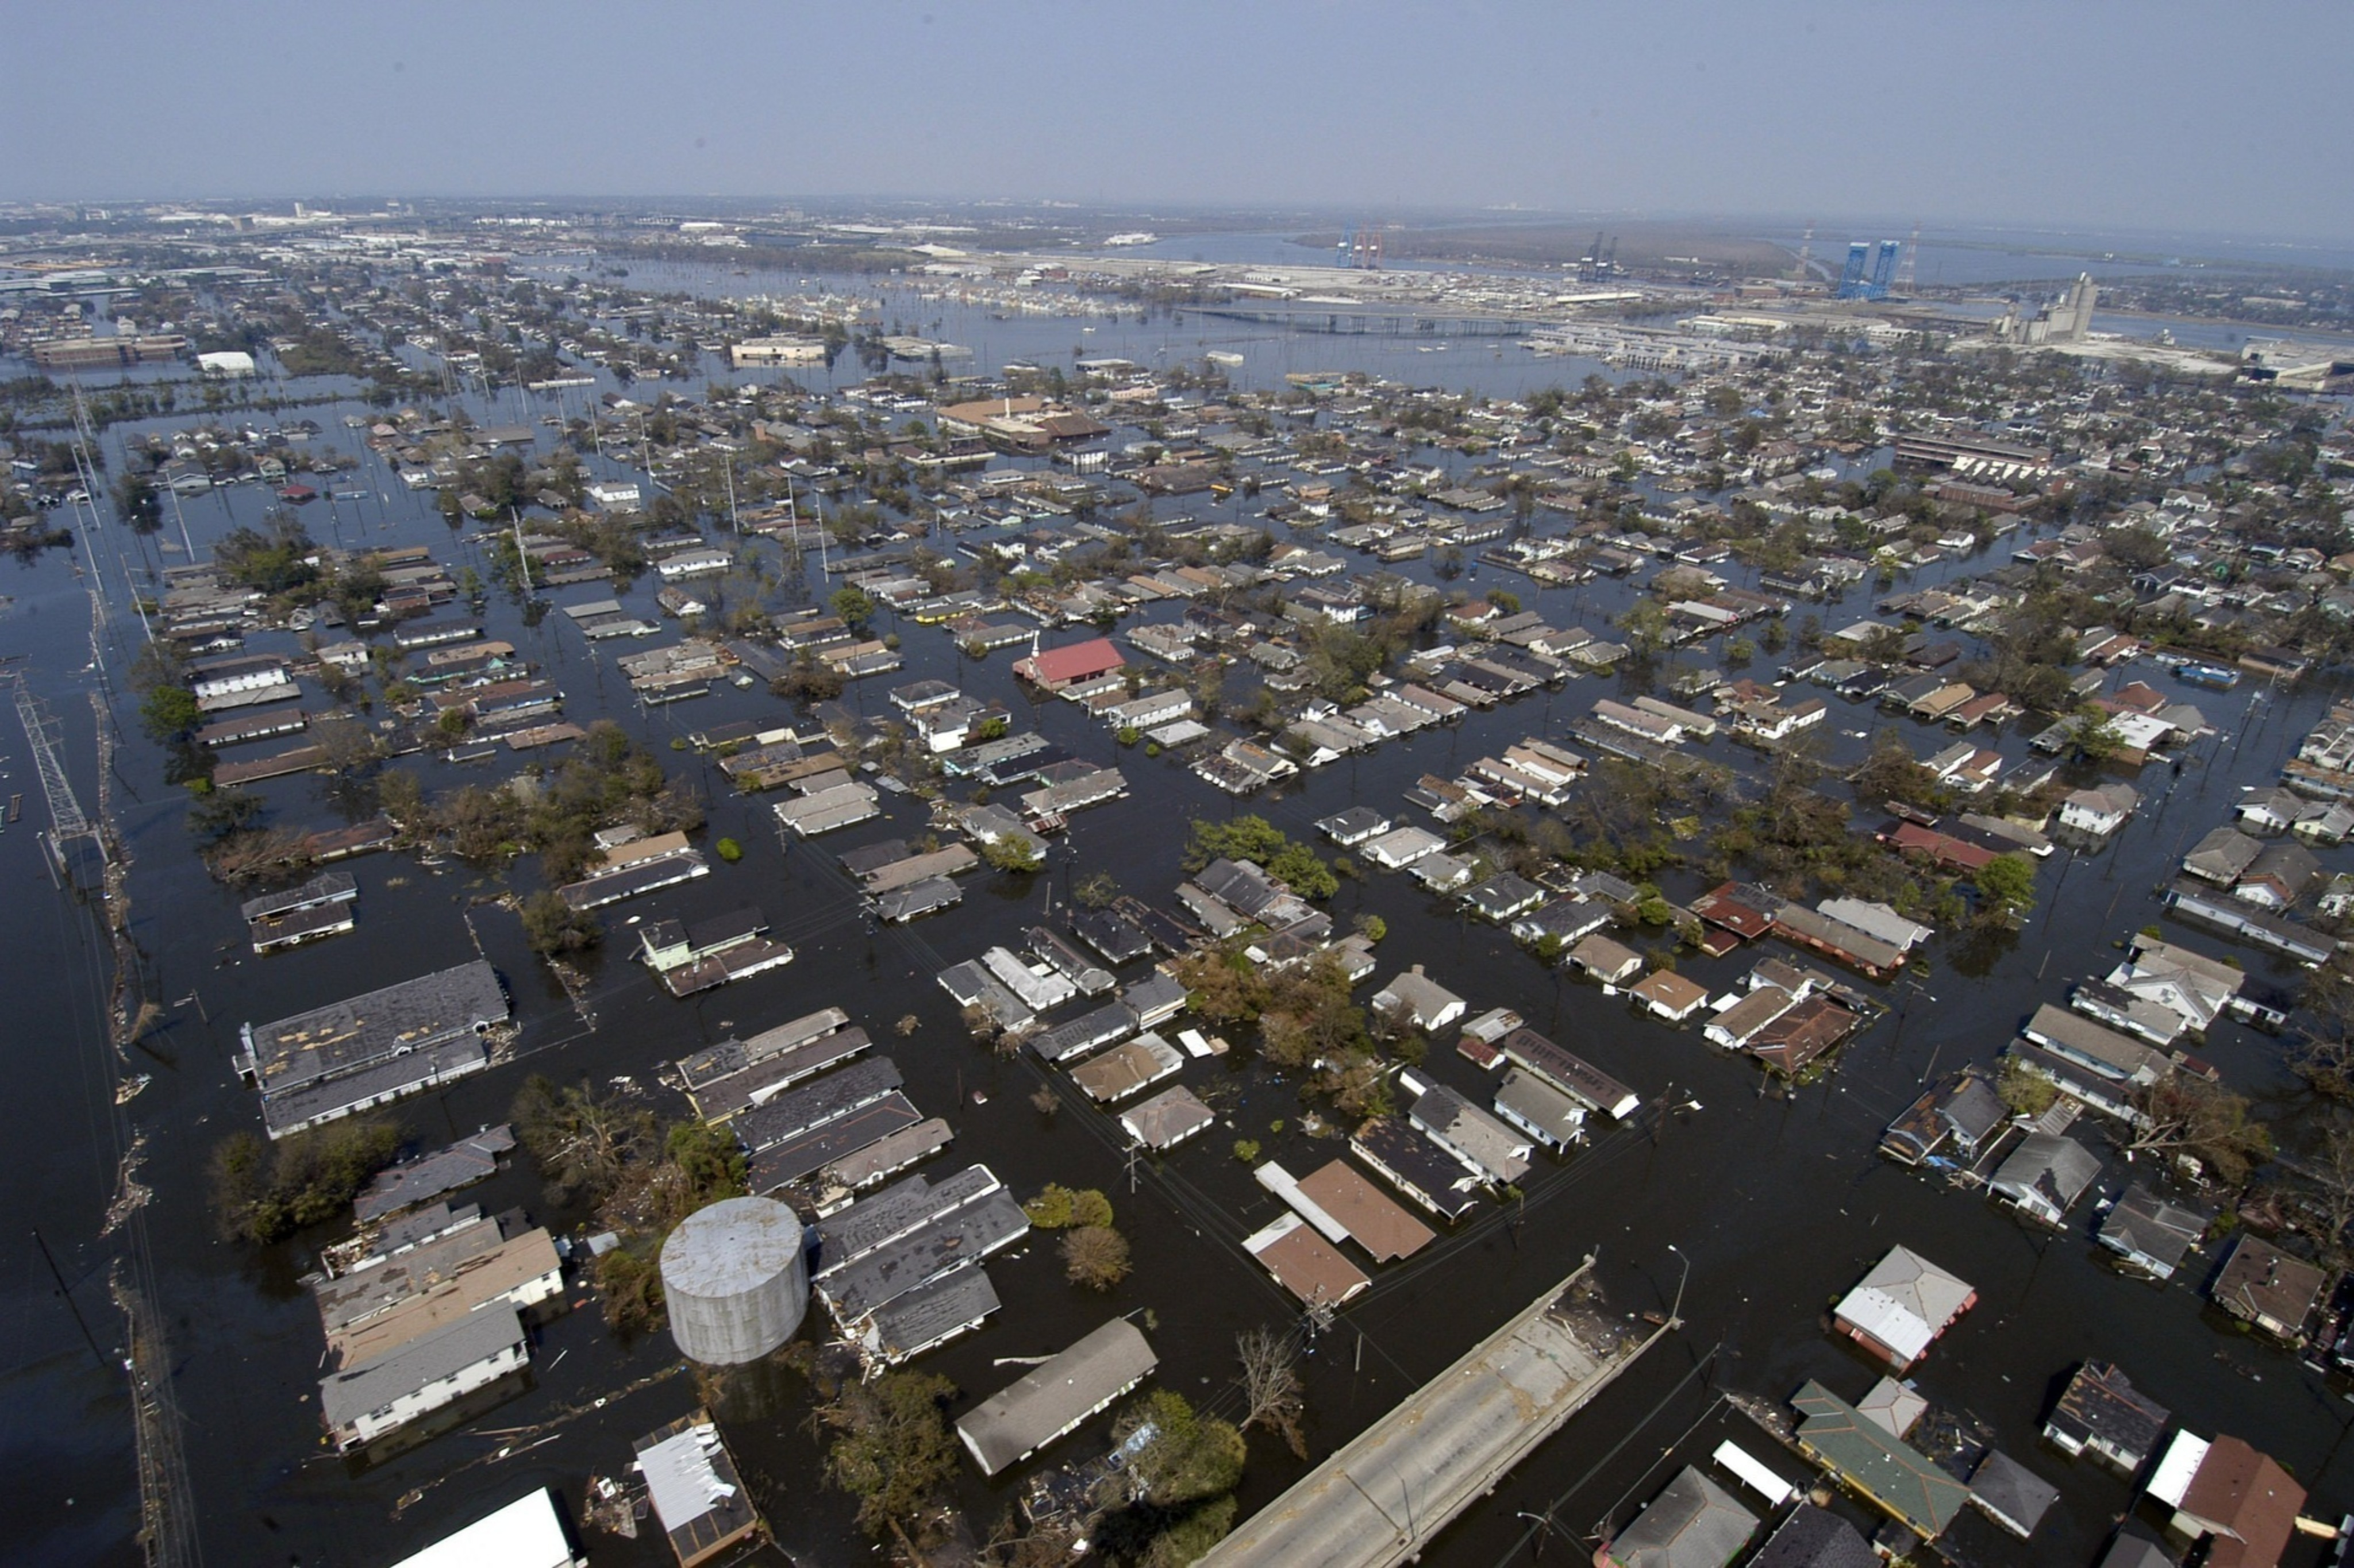 Flood Insurance in Baton Rouge